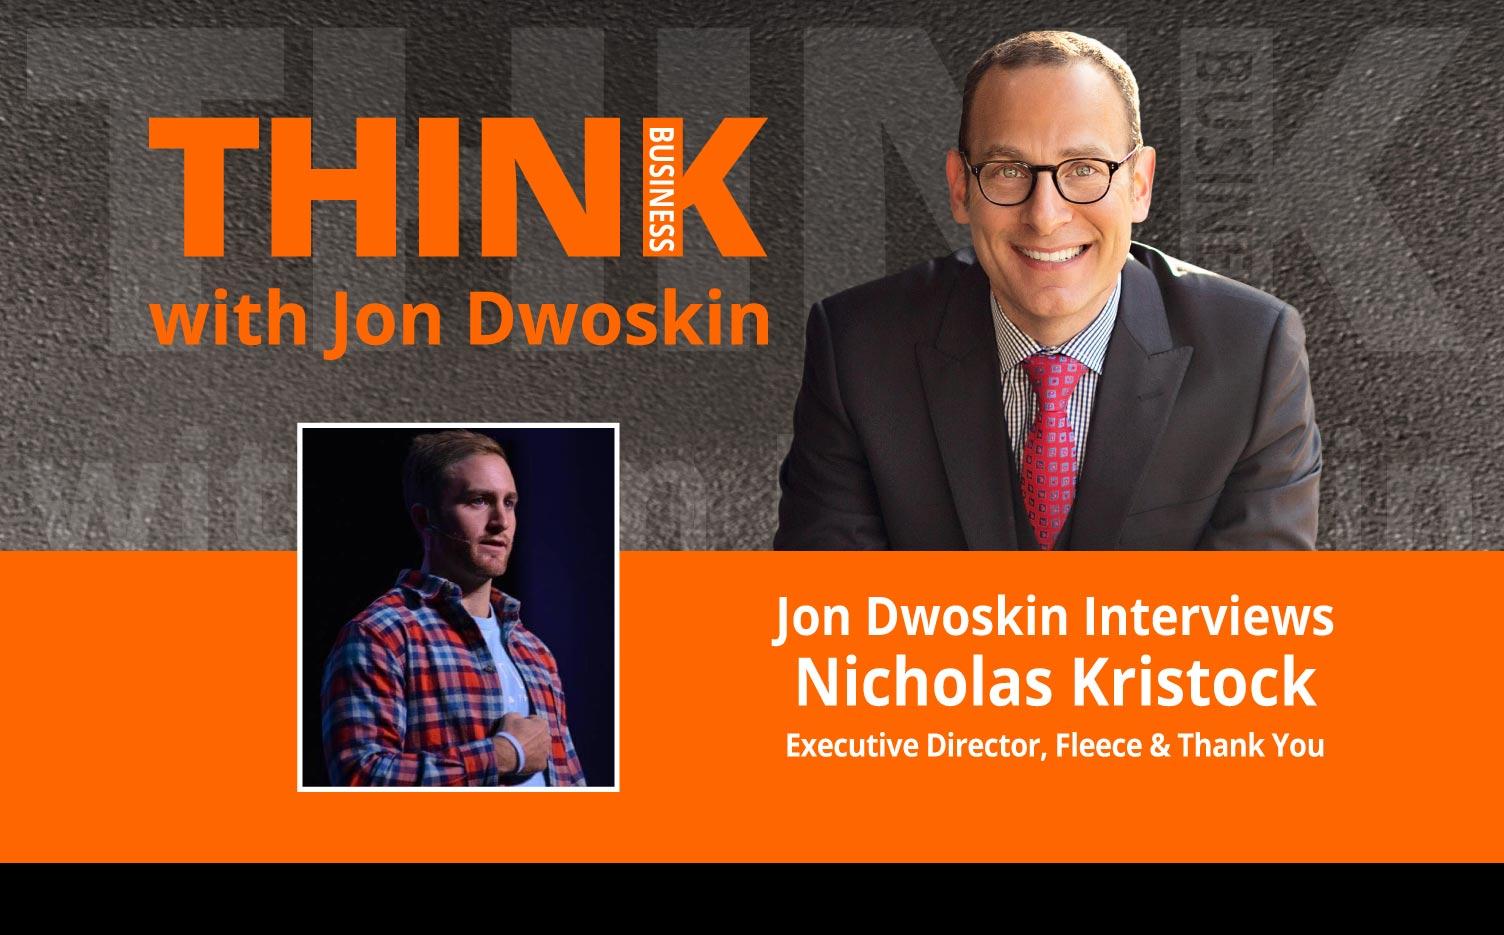 THINK Business Podcast: Jon Dwoskin Interviews Nicholas Kristock, Executive Director, Fleece & Thank You